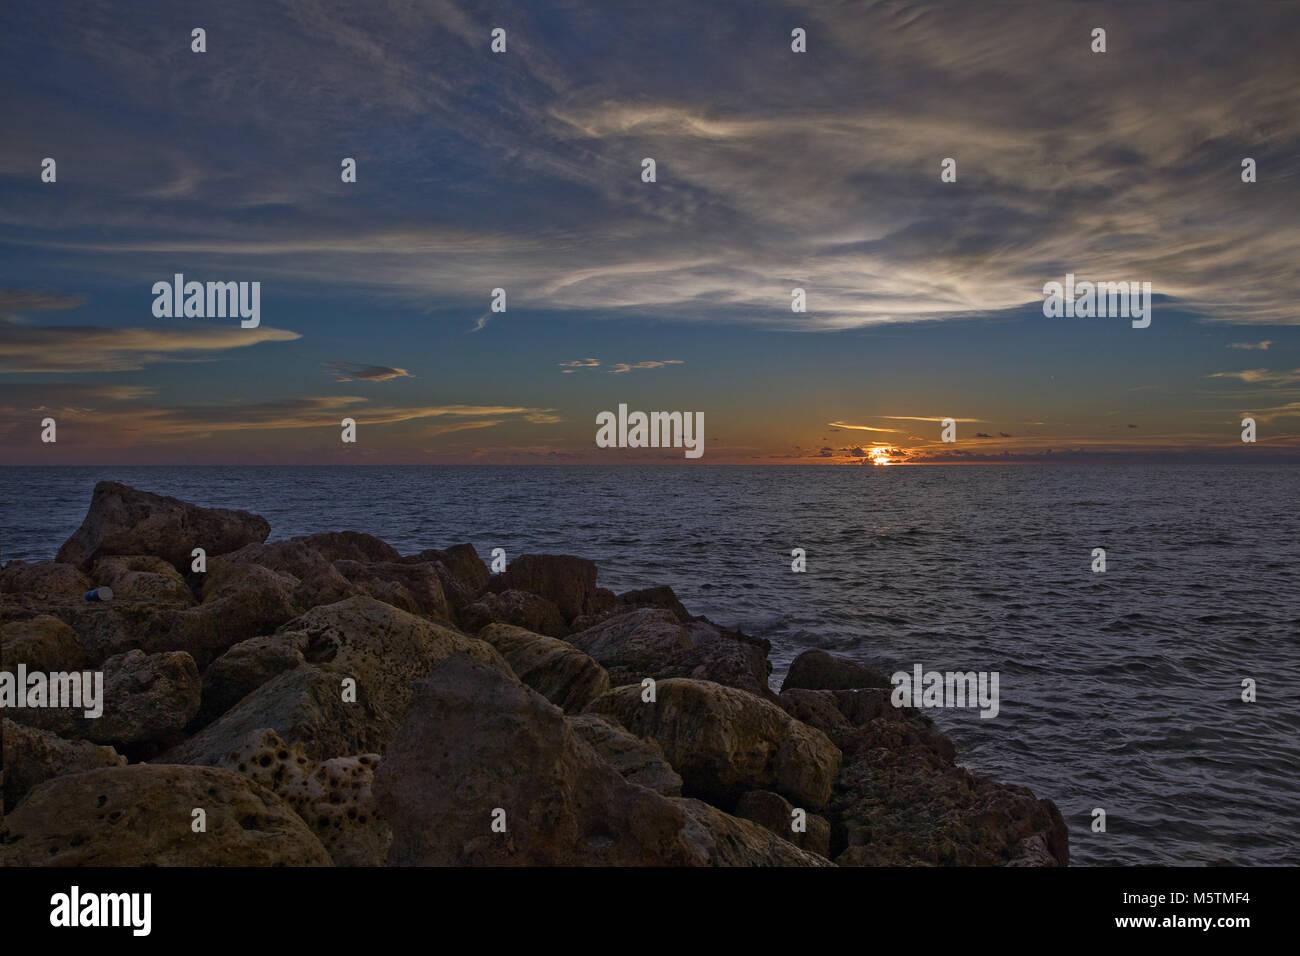 beautiful sunset at the calm sea - Stock Image